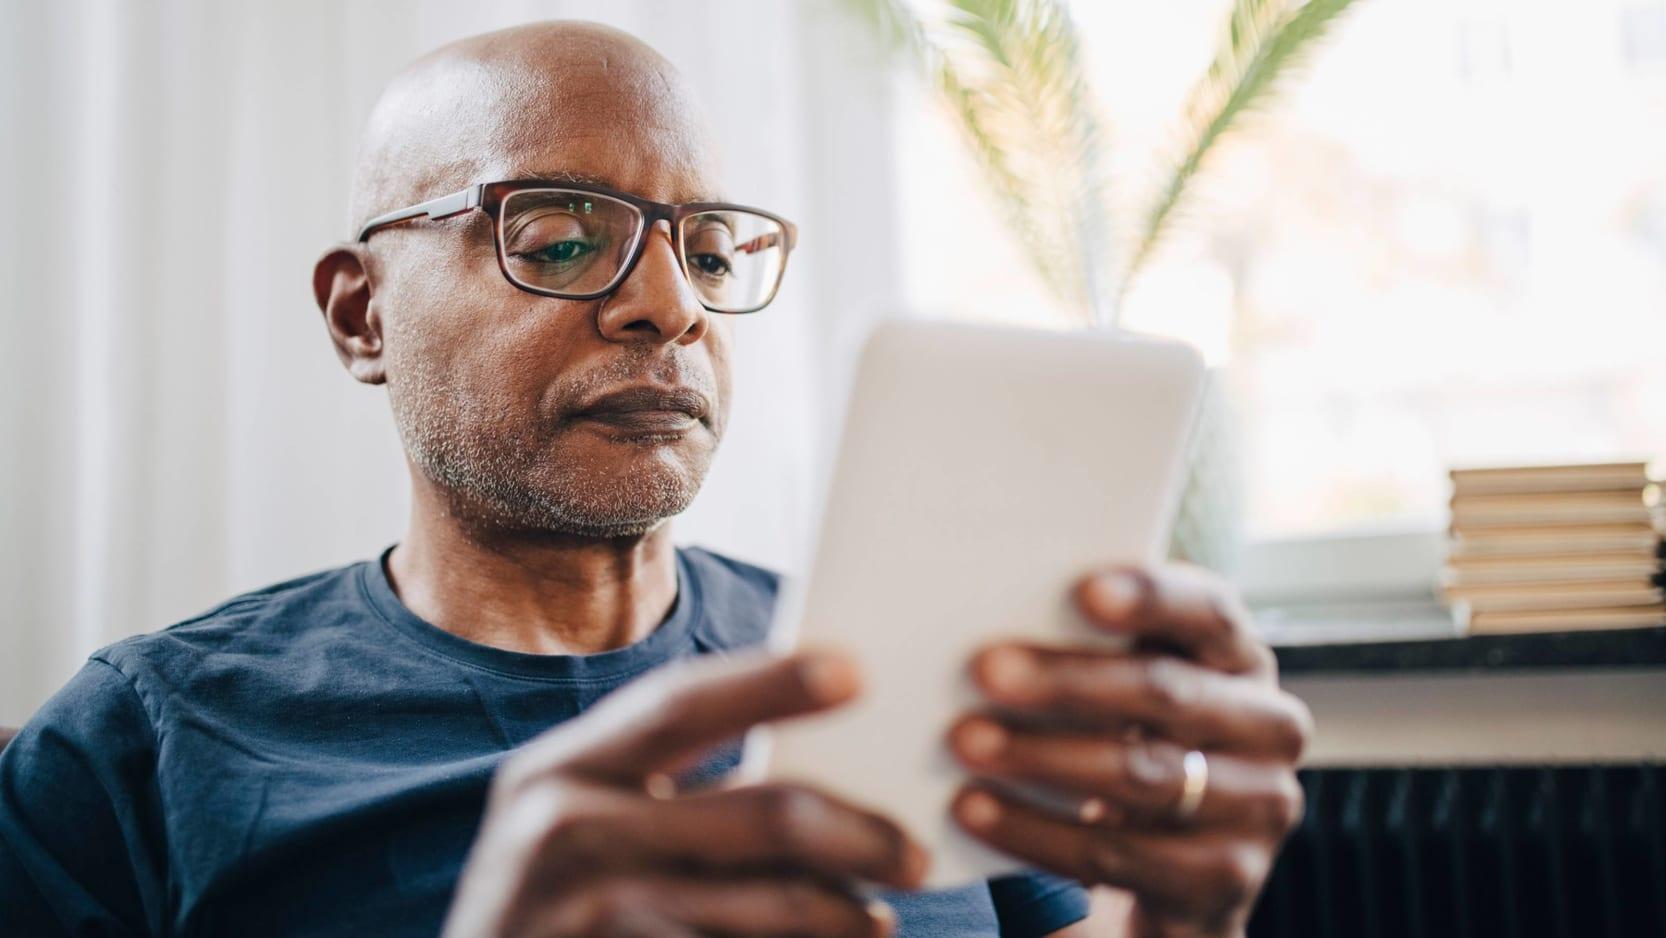 A senior man reading on a tablet device.